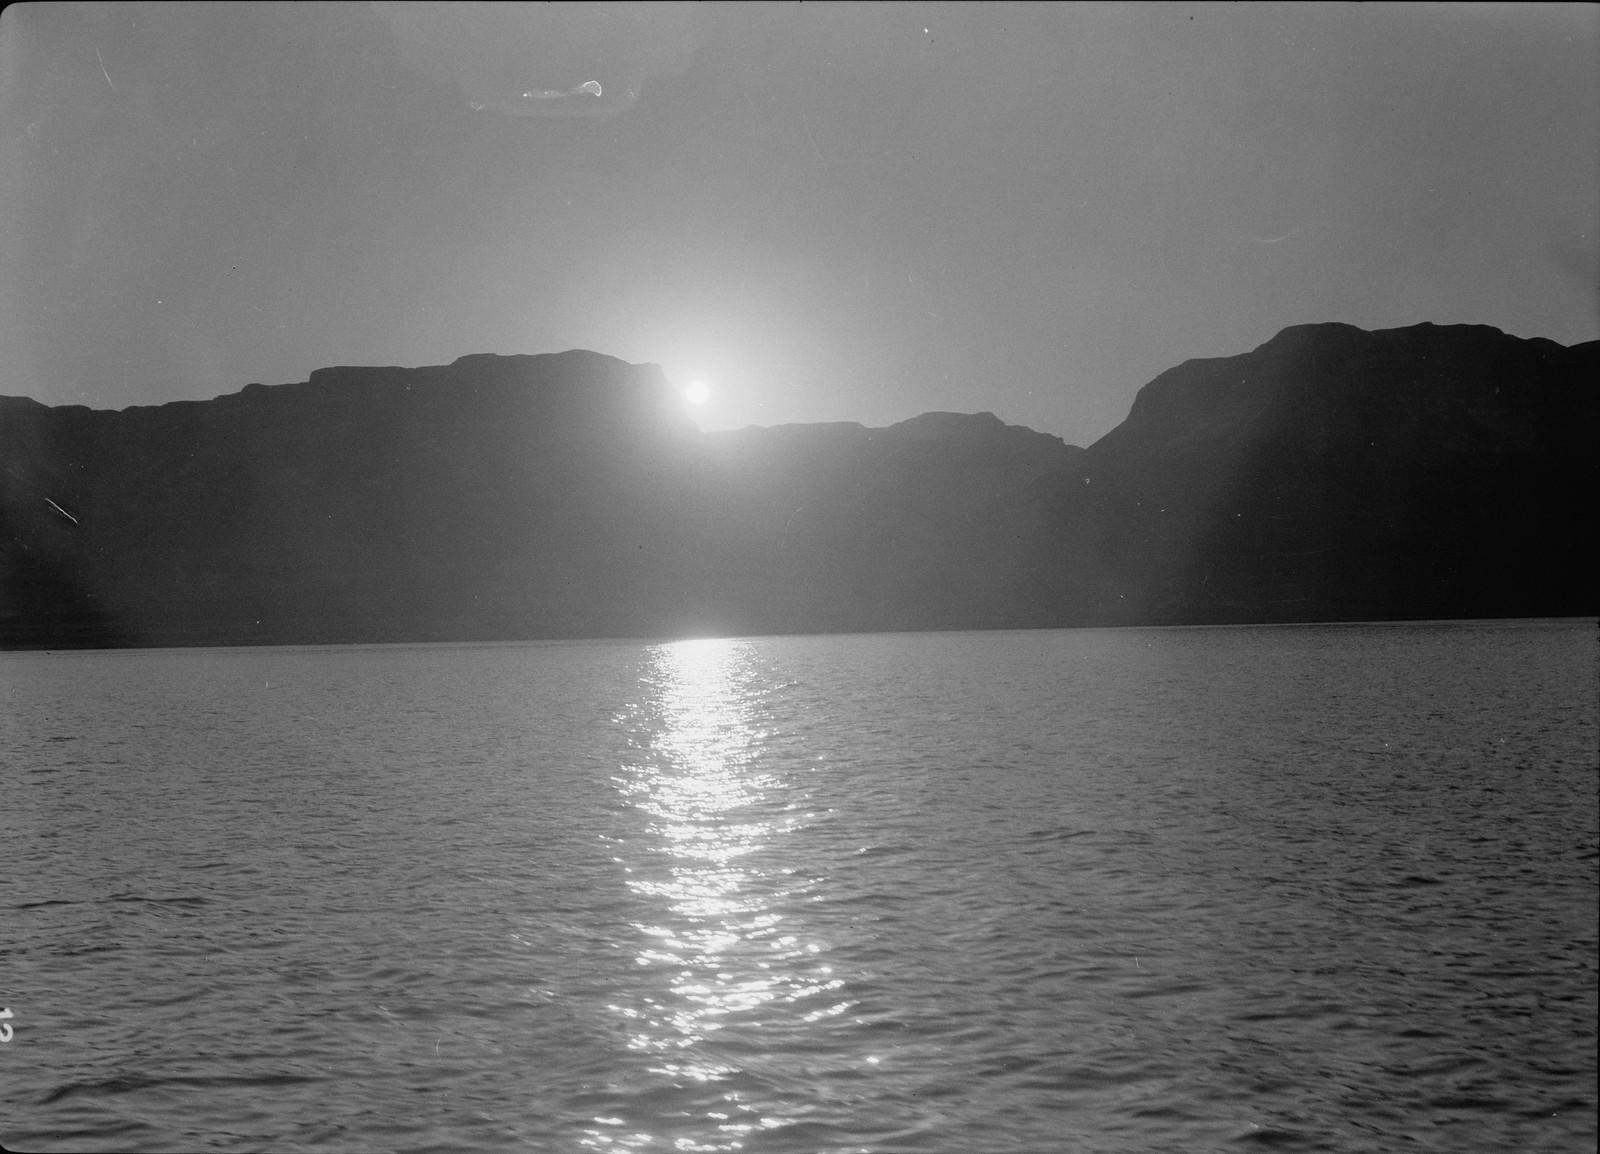 26. Солнце заходит за крутой западный берег